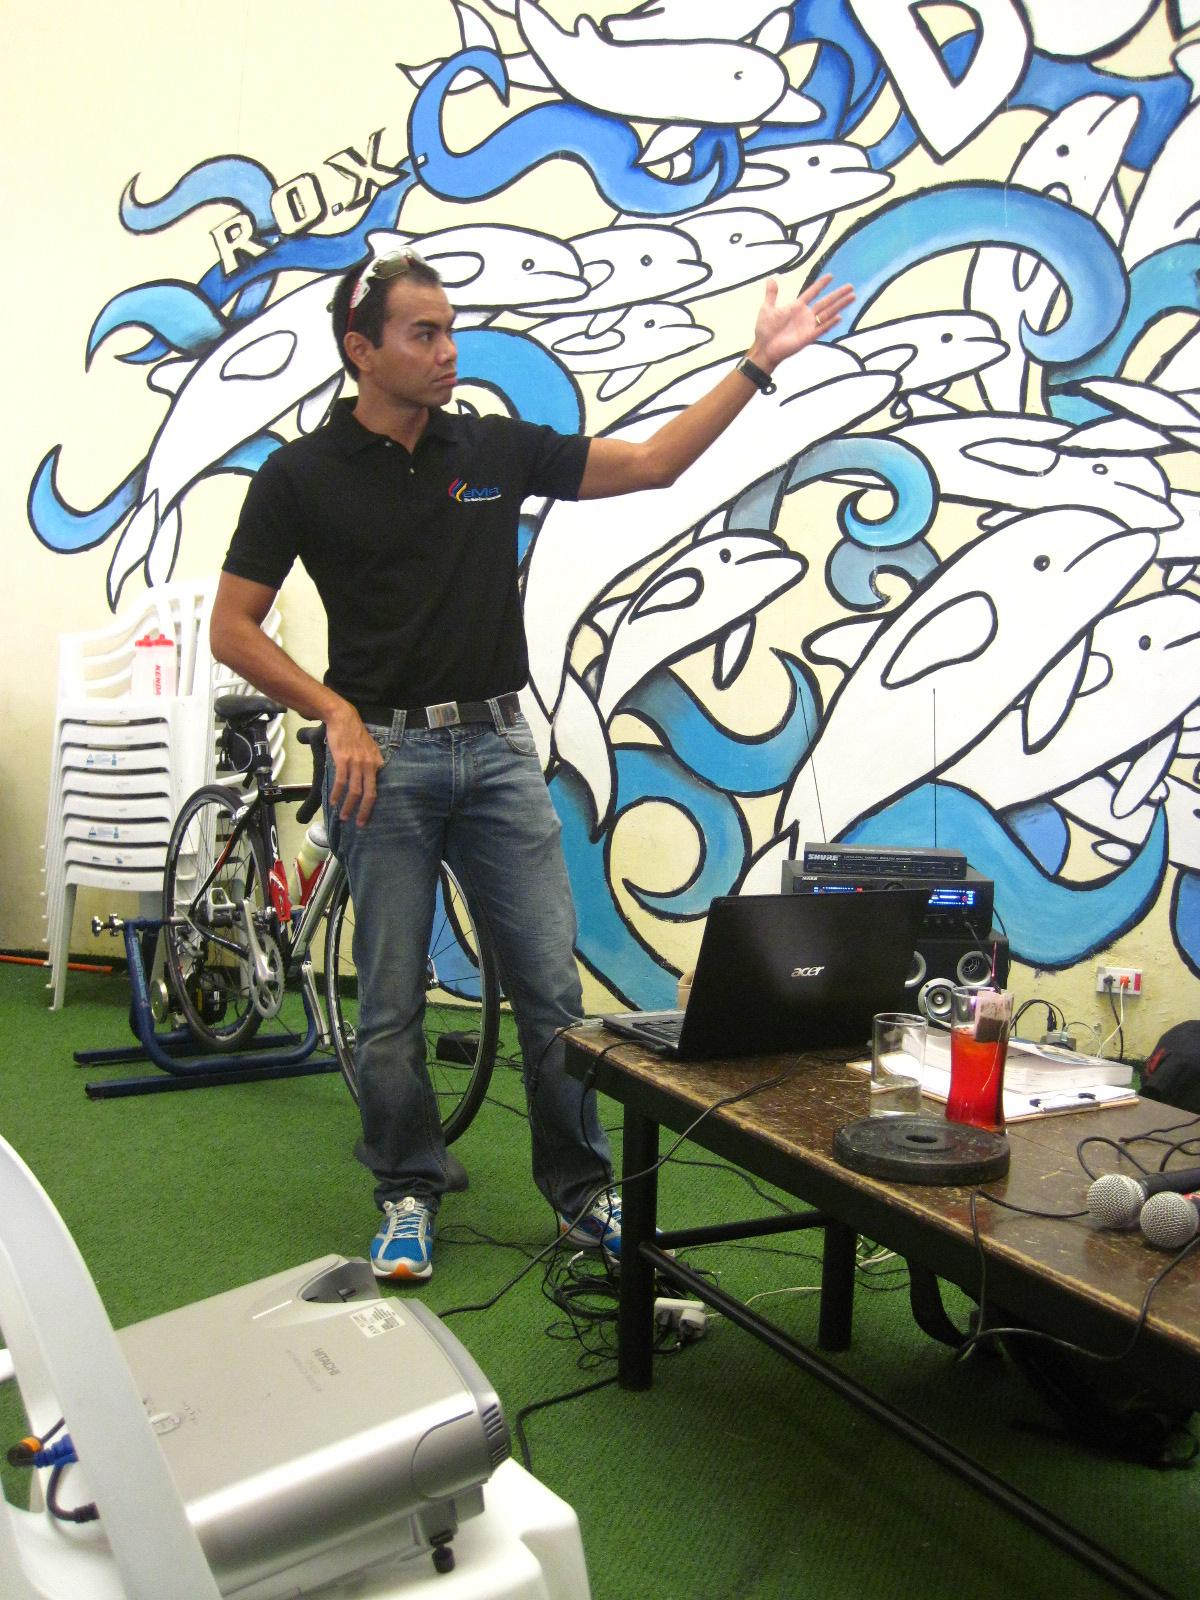 Suunto Power Zone: Andy Leuterio of Alpha Training Systems